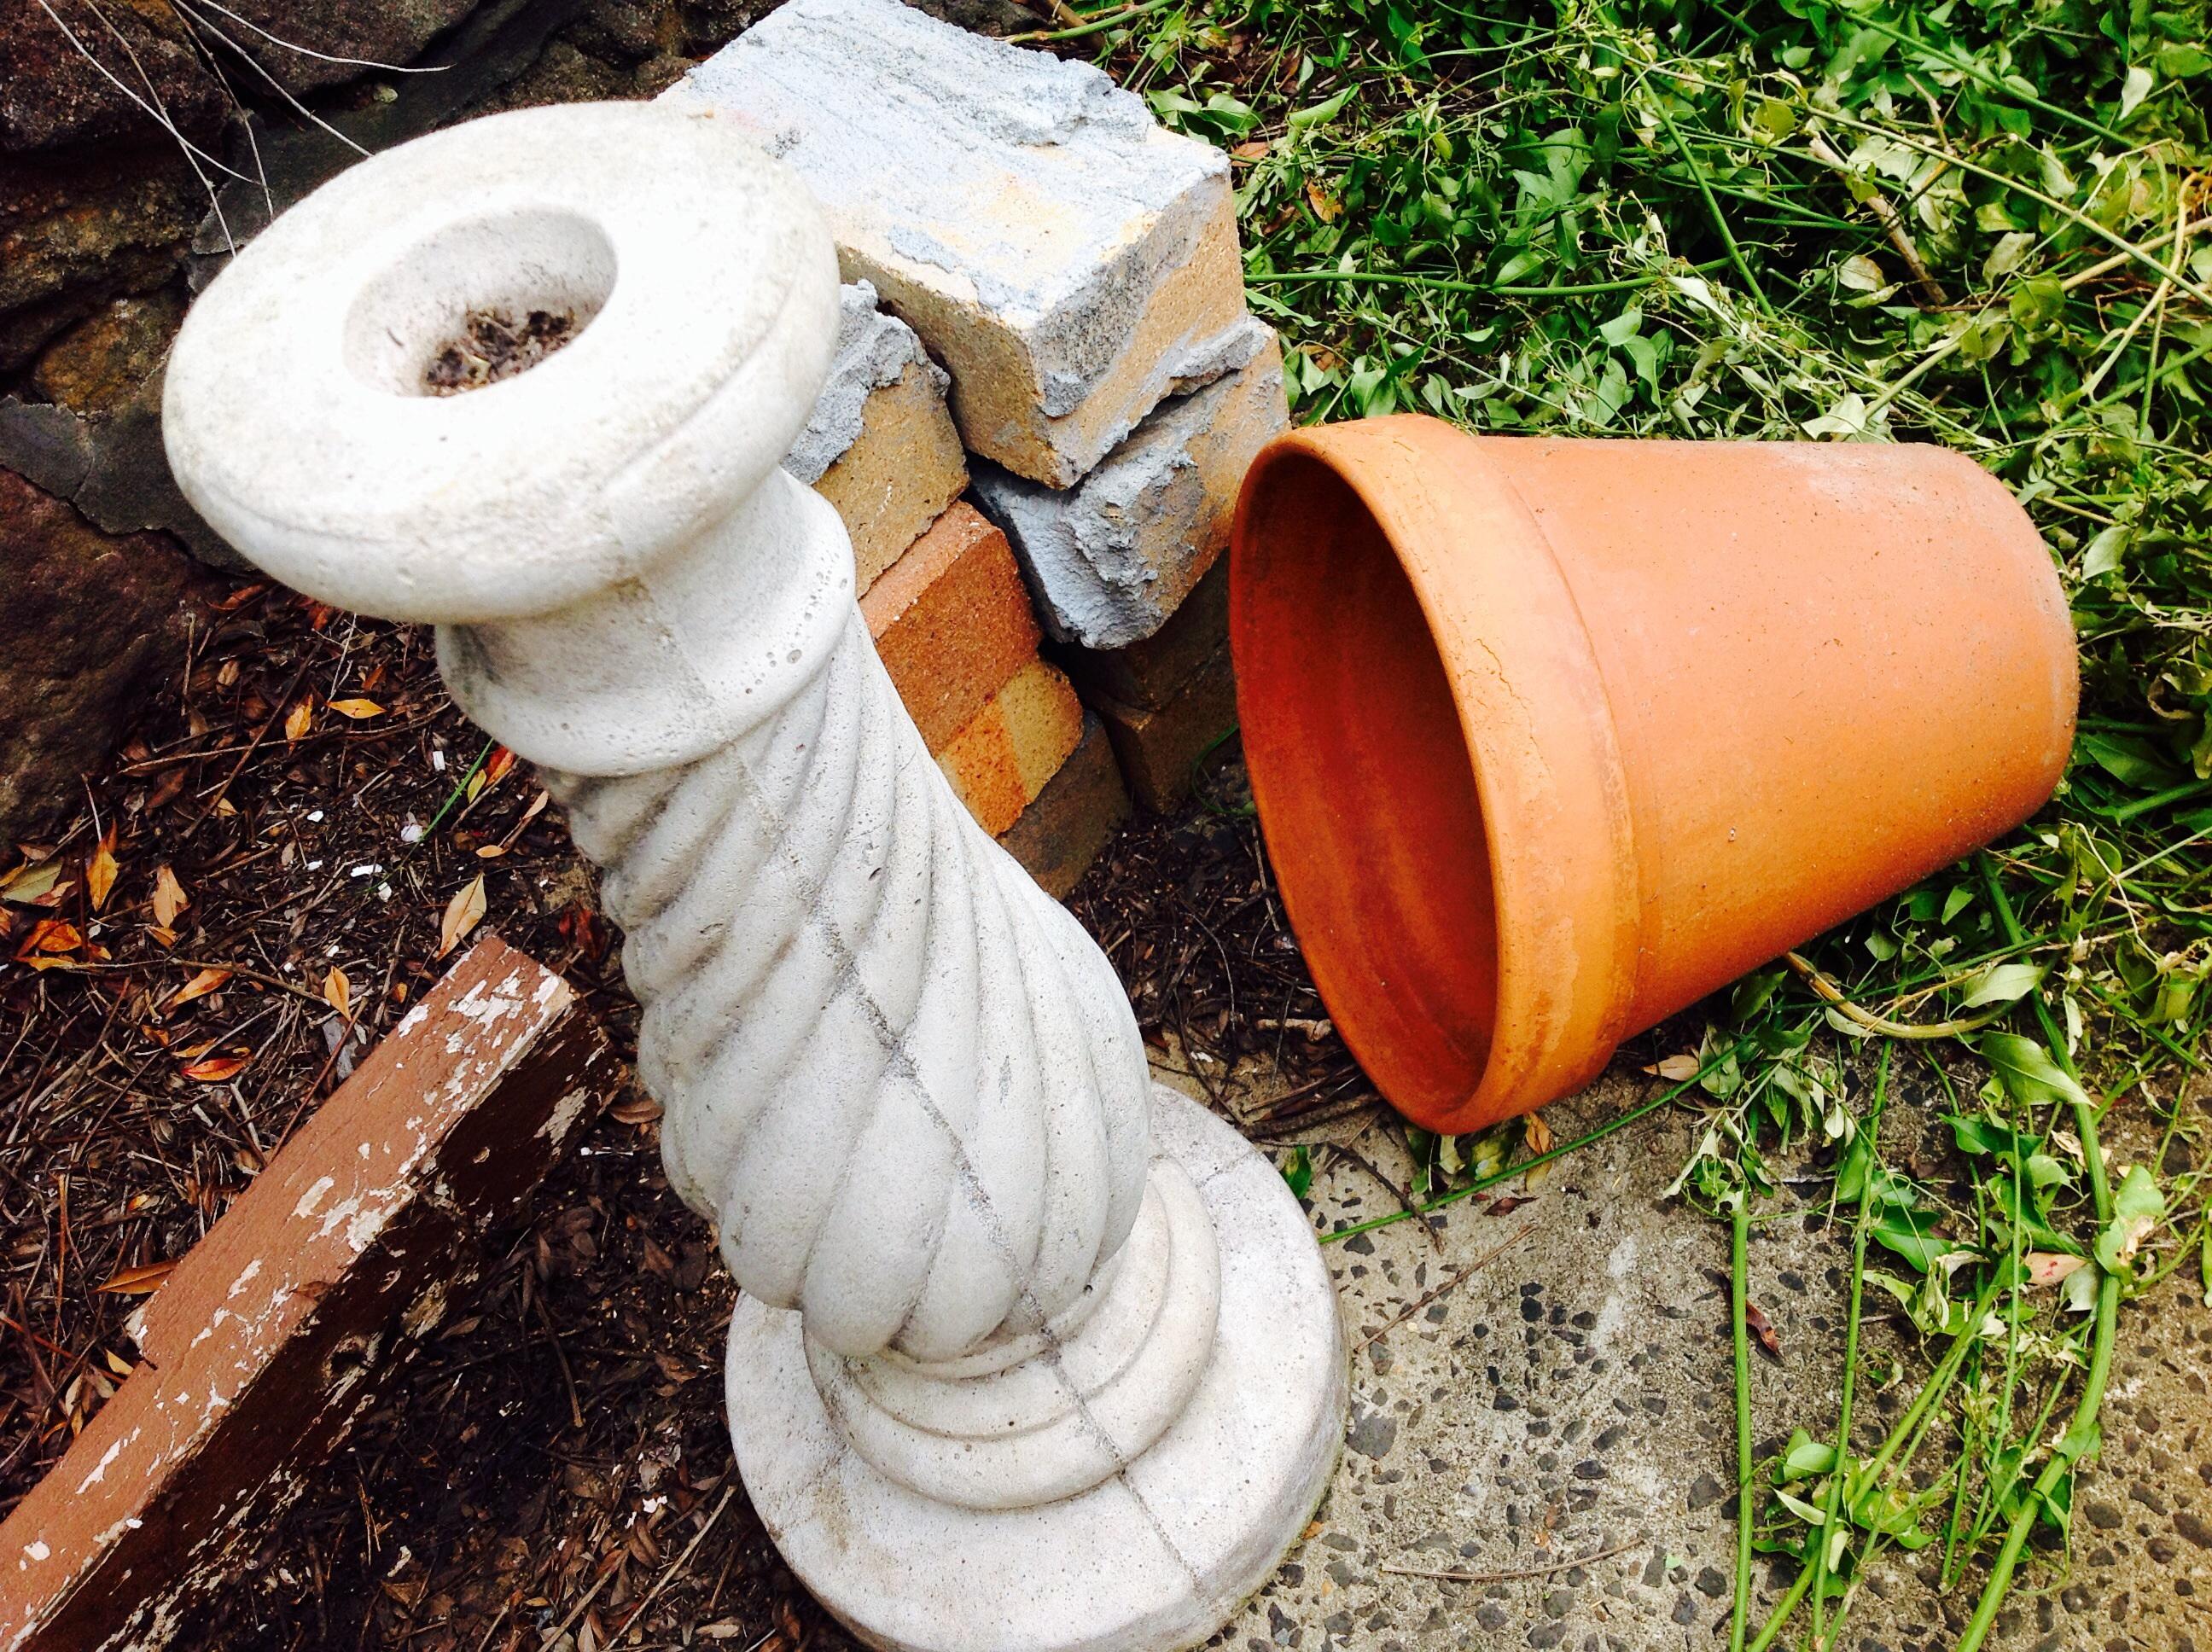 Declutter, earthen ware pots, container garden , decluttering home, declutter mind, sort , minimise, prepare garden, Autumn garden,clean house,